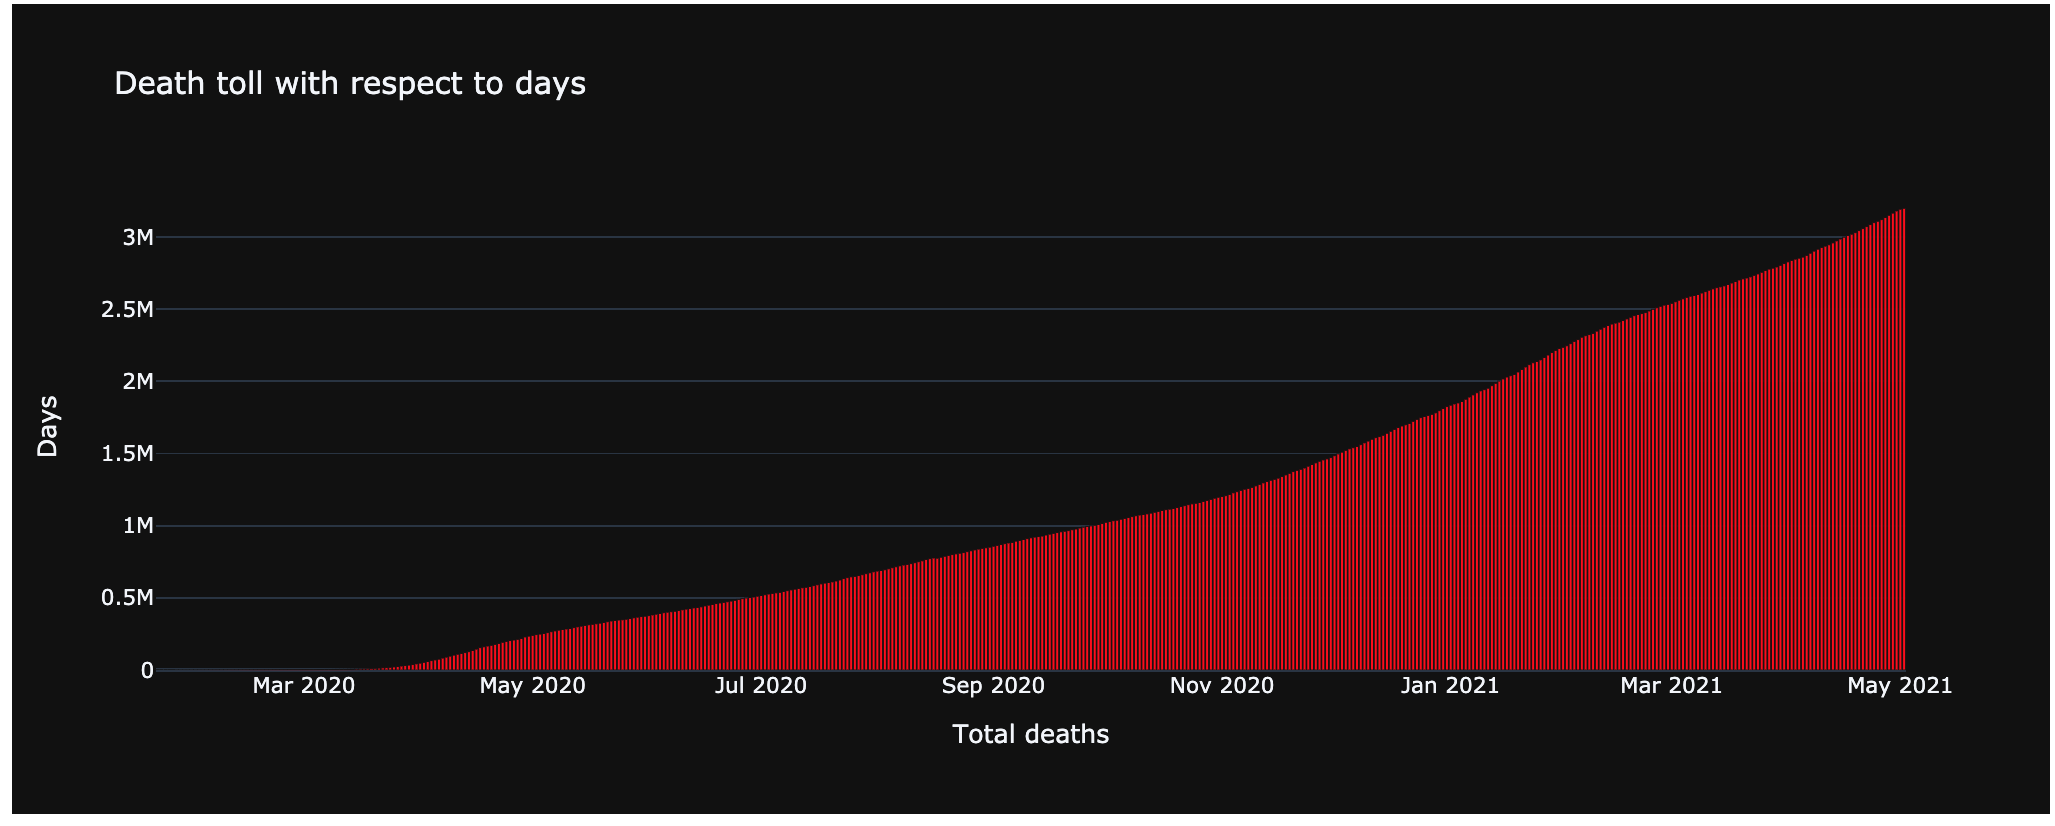 Death toll based on Days